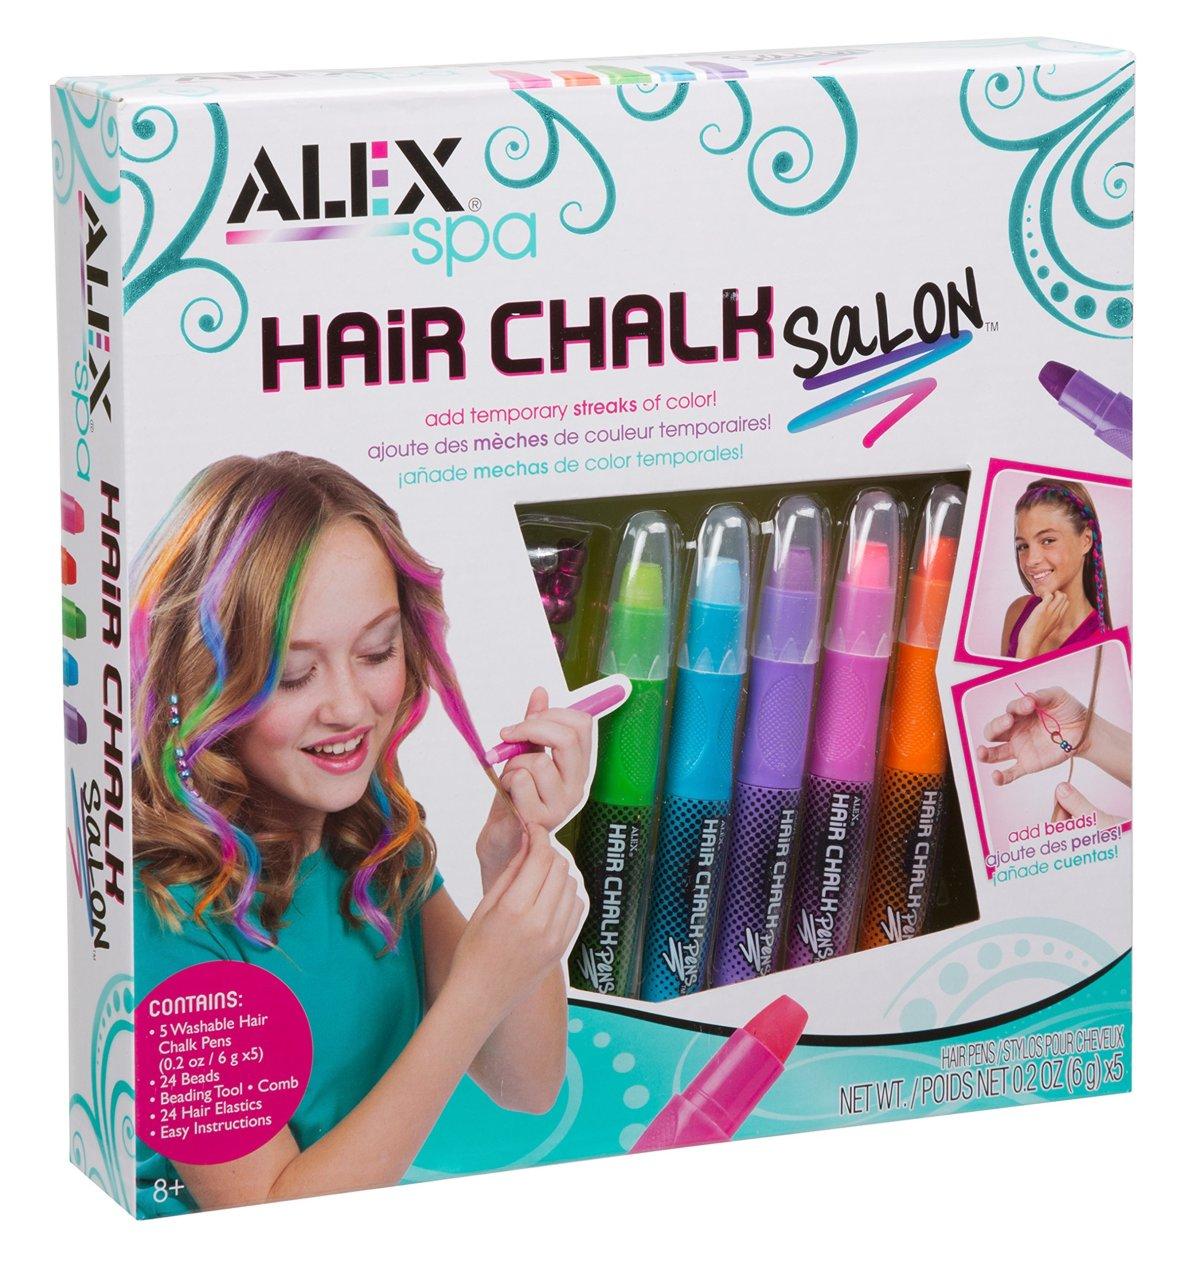 Craft kit for kids - Alex Spa Hair Chalk Salon Toys Craft Kit Kids Girls Children Fun Glitter Fashion